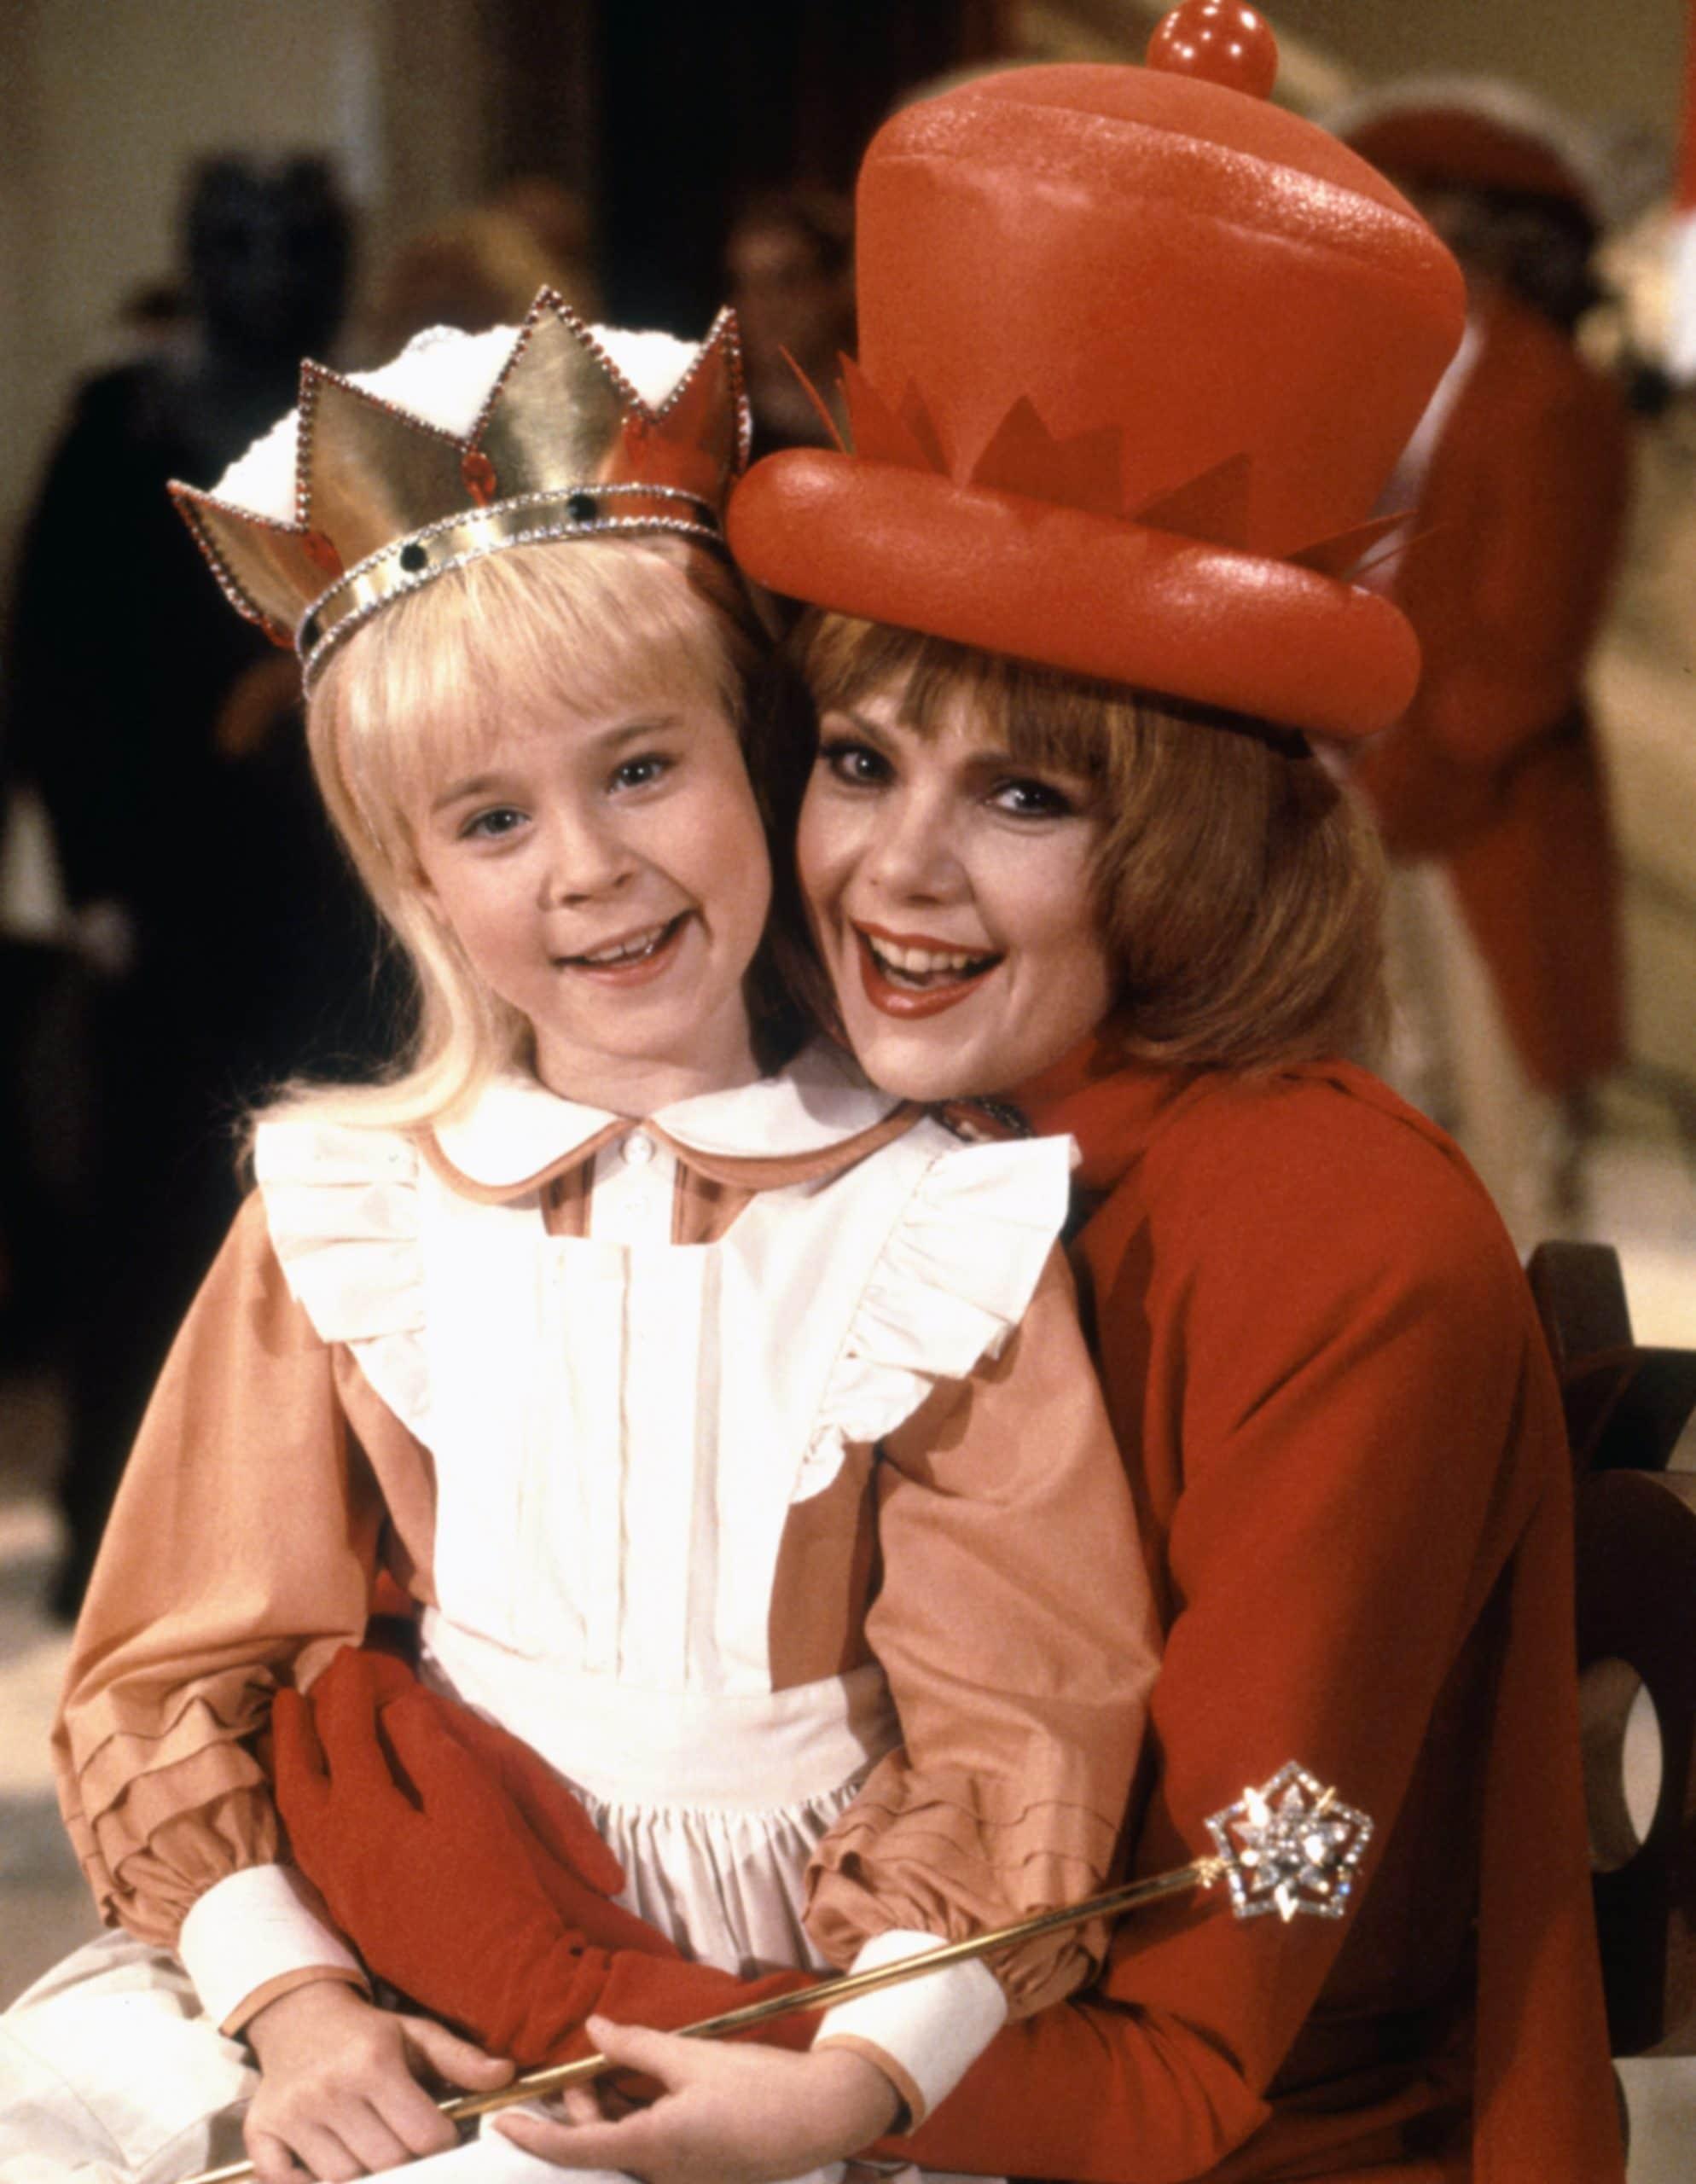 ALICE IN WONDERLAND, Natalie Gregory, Ann Jillian, 1985